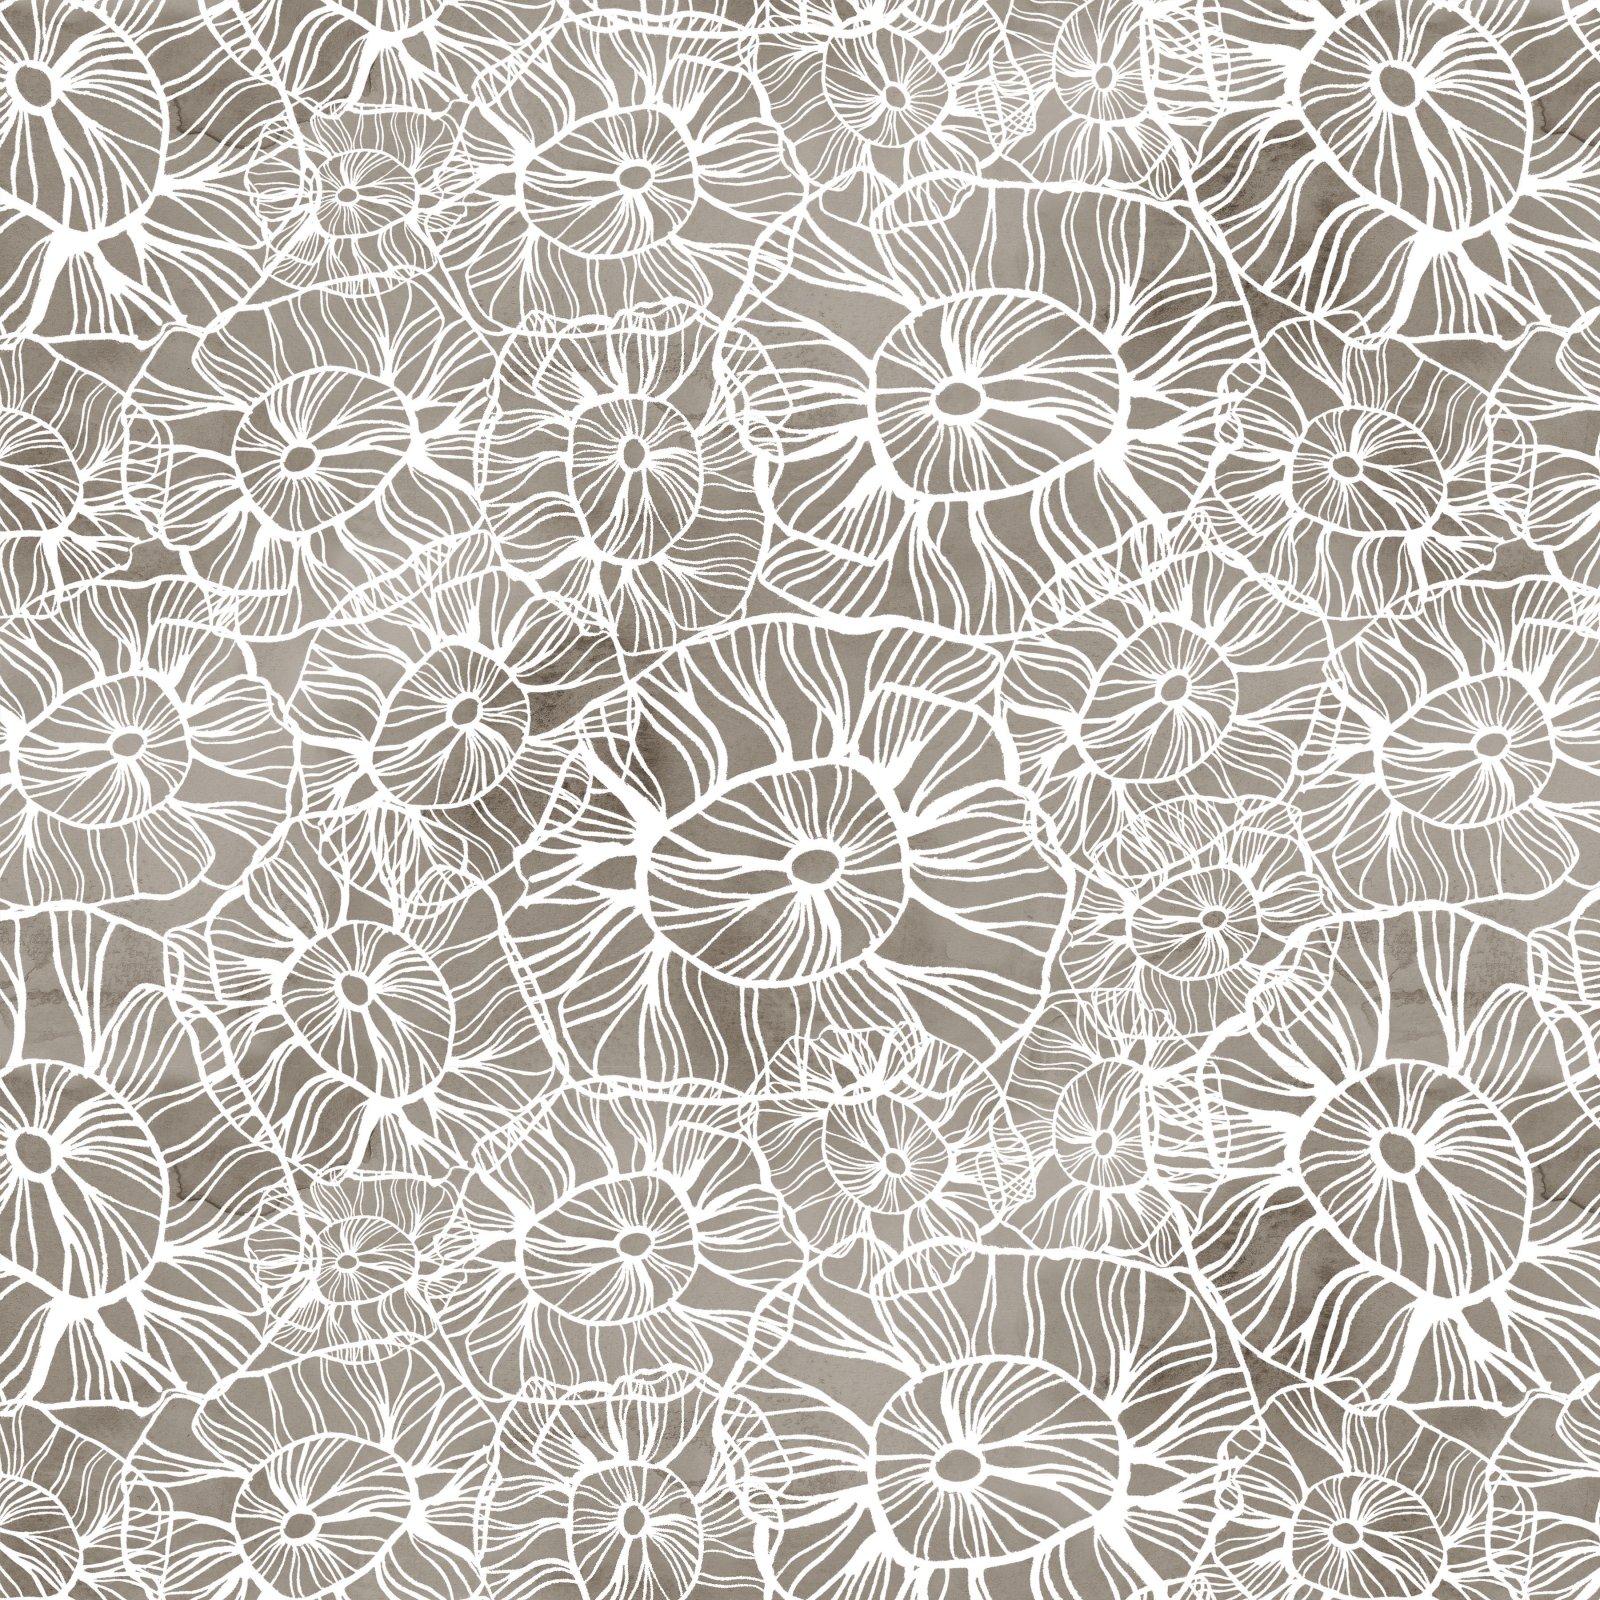 Time and Tide: Sea Flower - Mocha